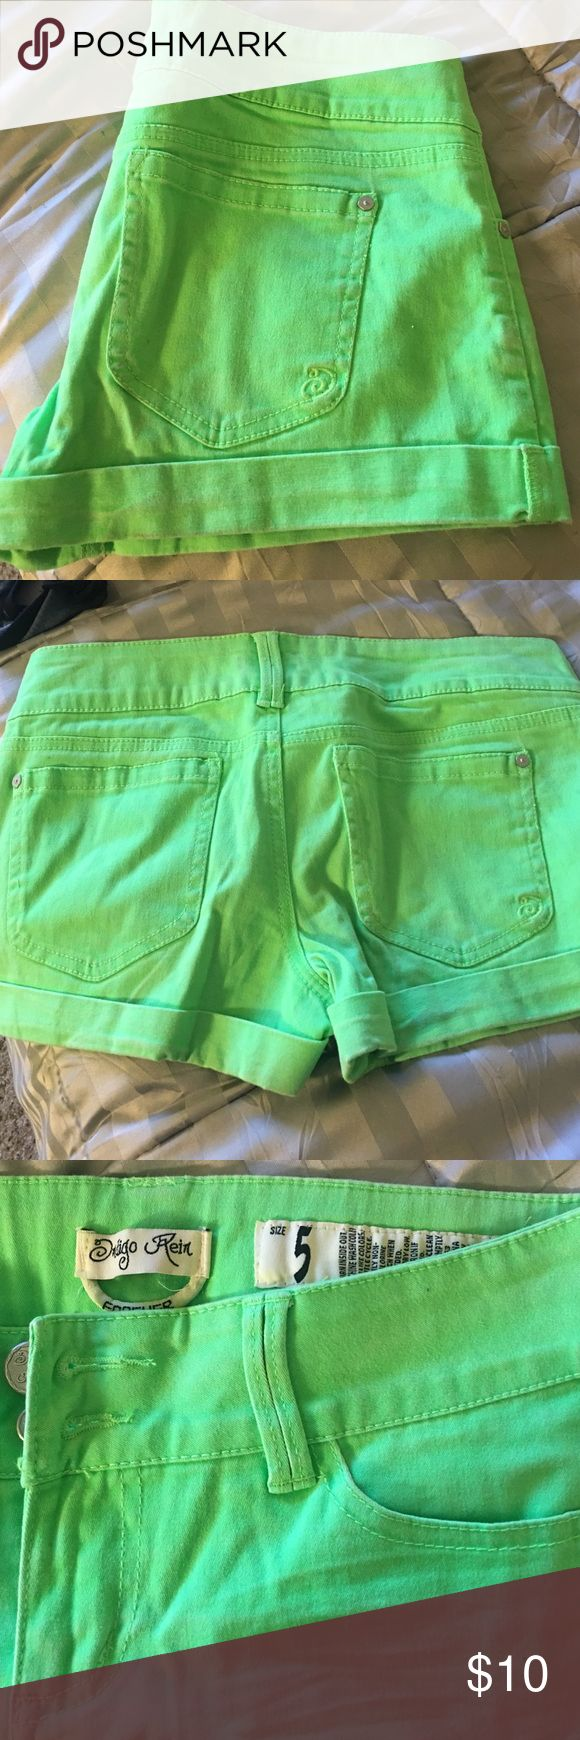 Lime green short shorts Super cute lime green shorts Shorts